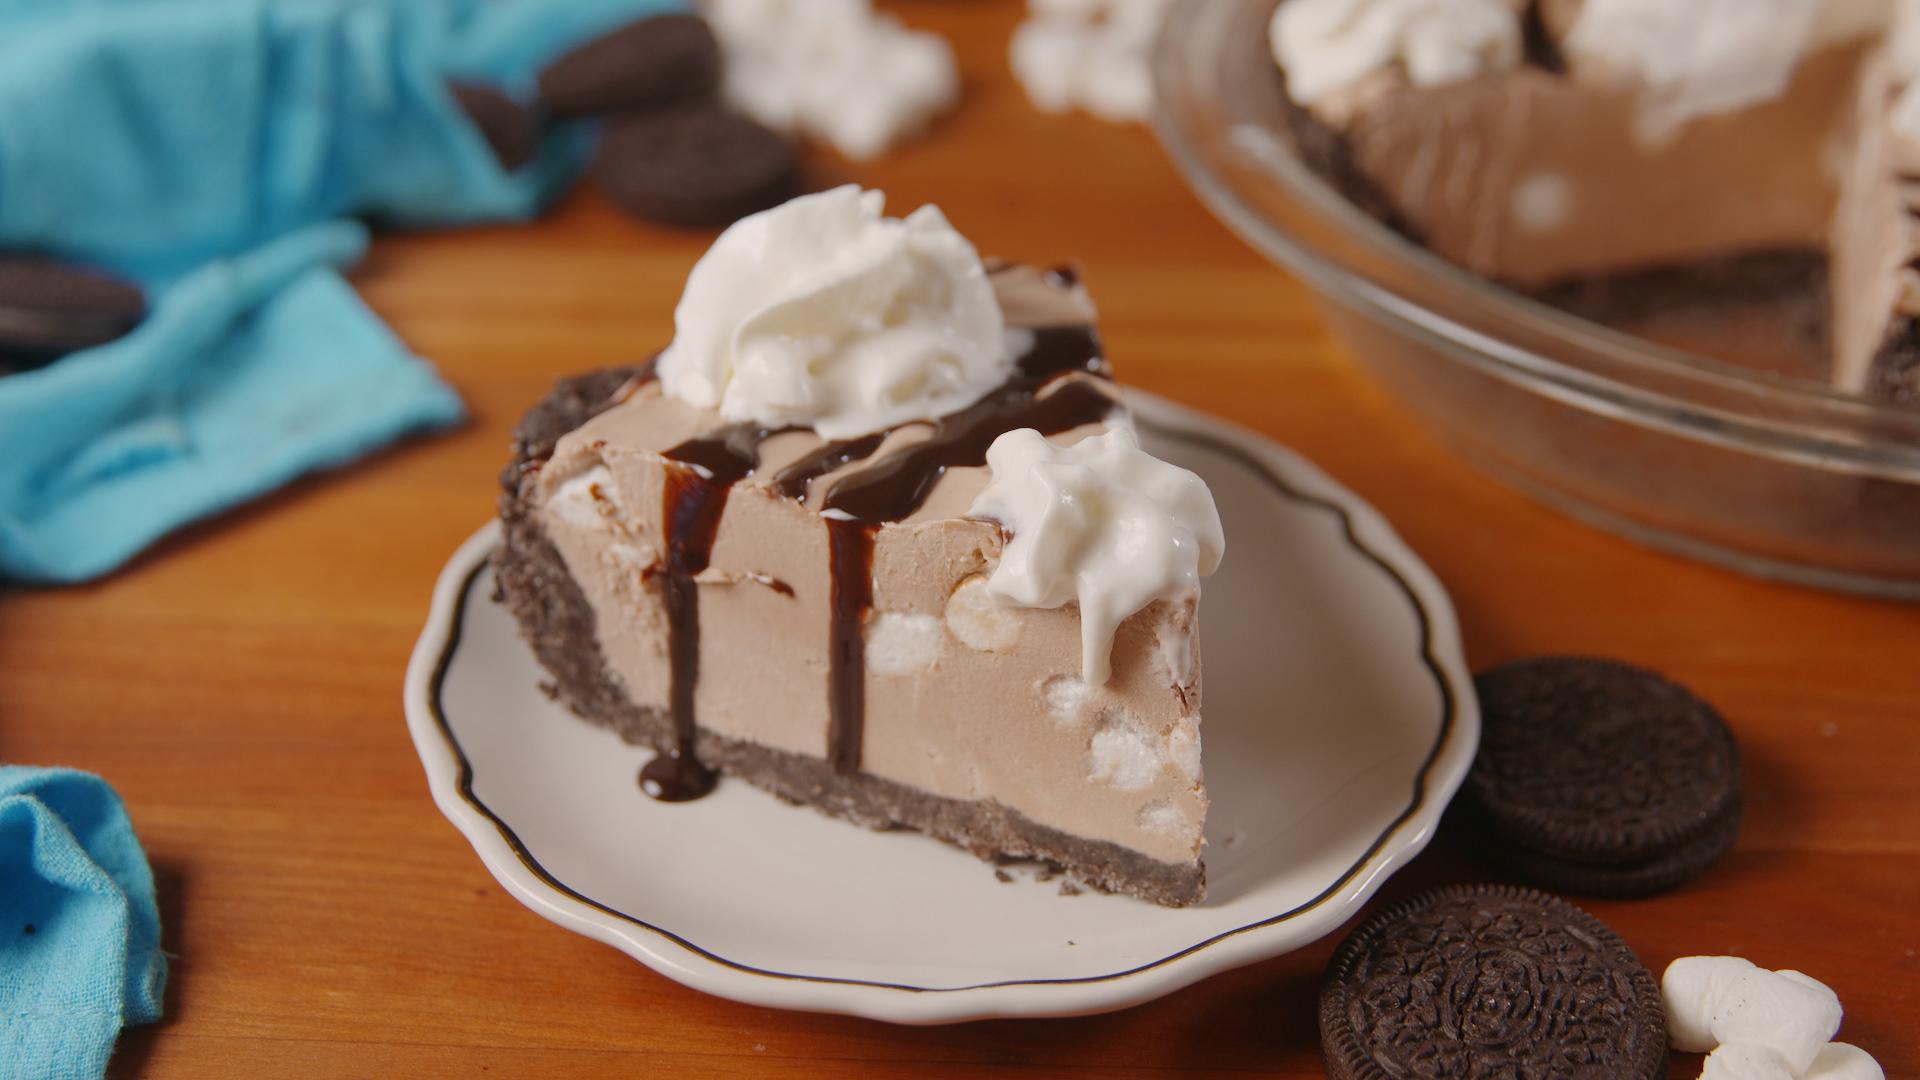 The Hottest Dessert This Summer: Frozen Hot Chocolate Cheesecake